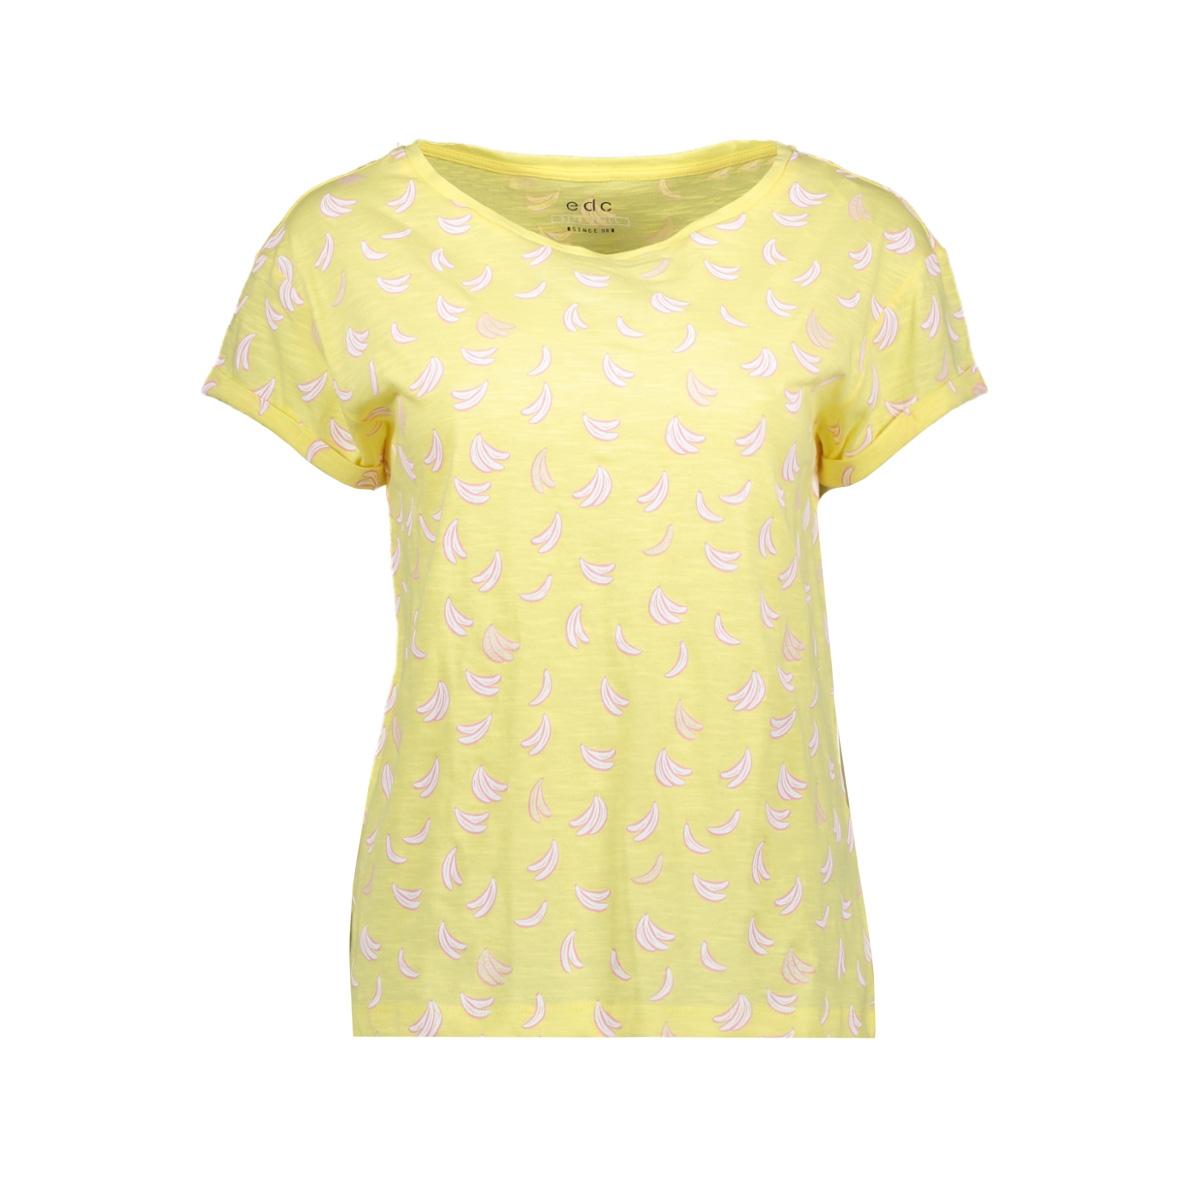 978a5c6e399 slub jersey shirt met print 059cc1k020 edc t-shirt c745